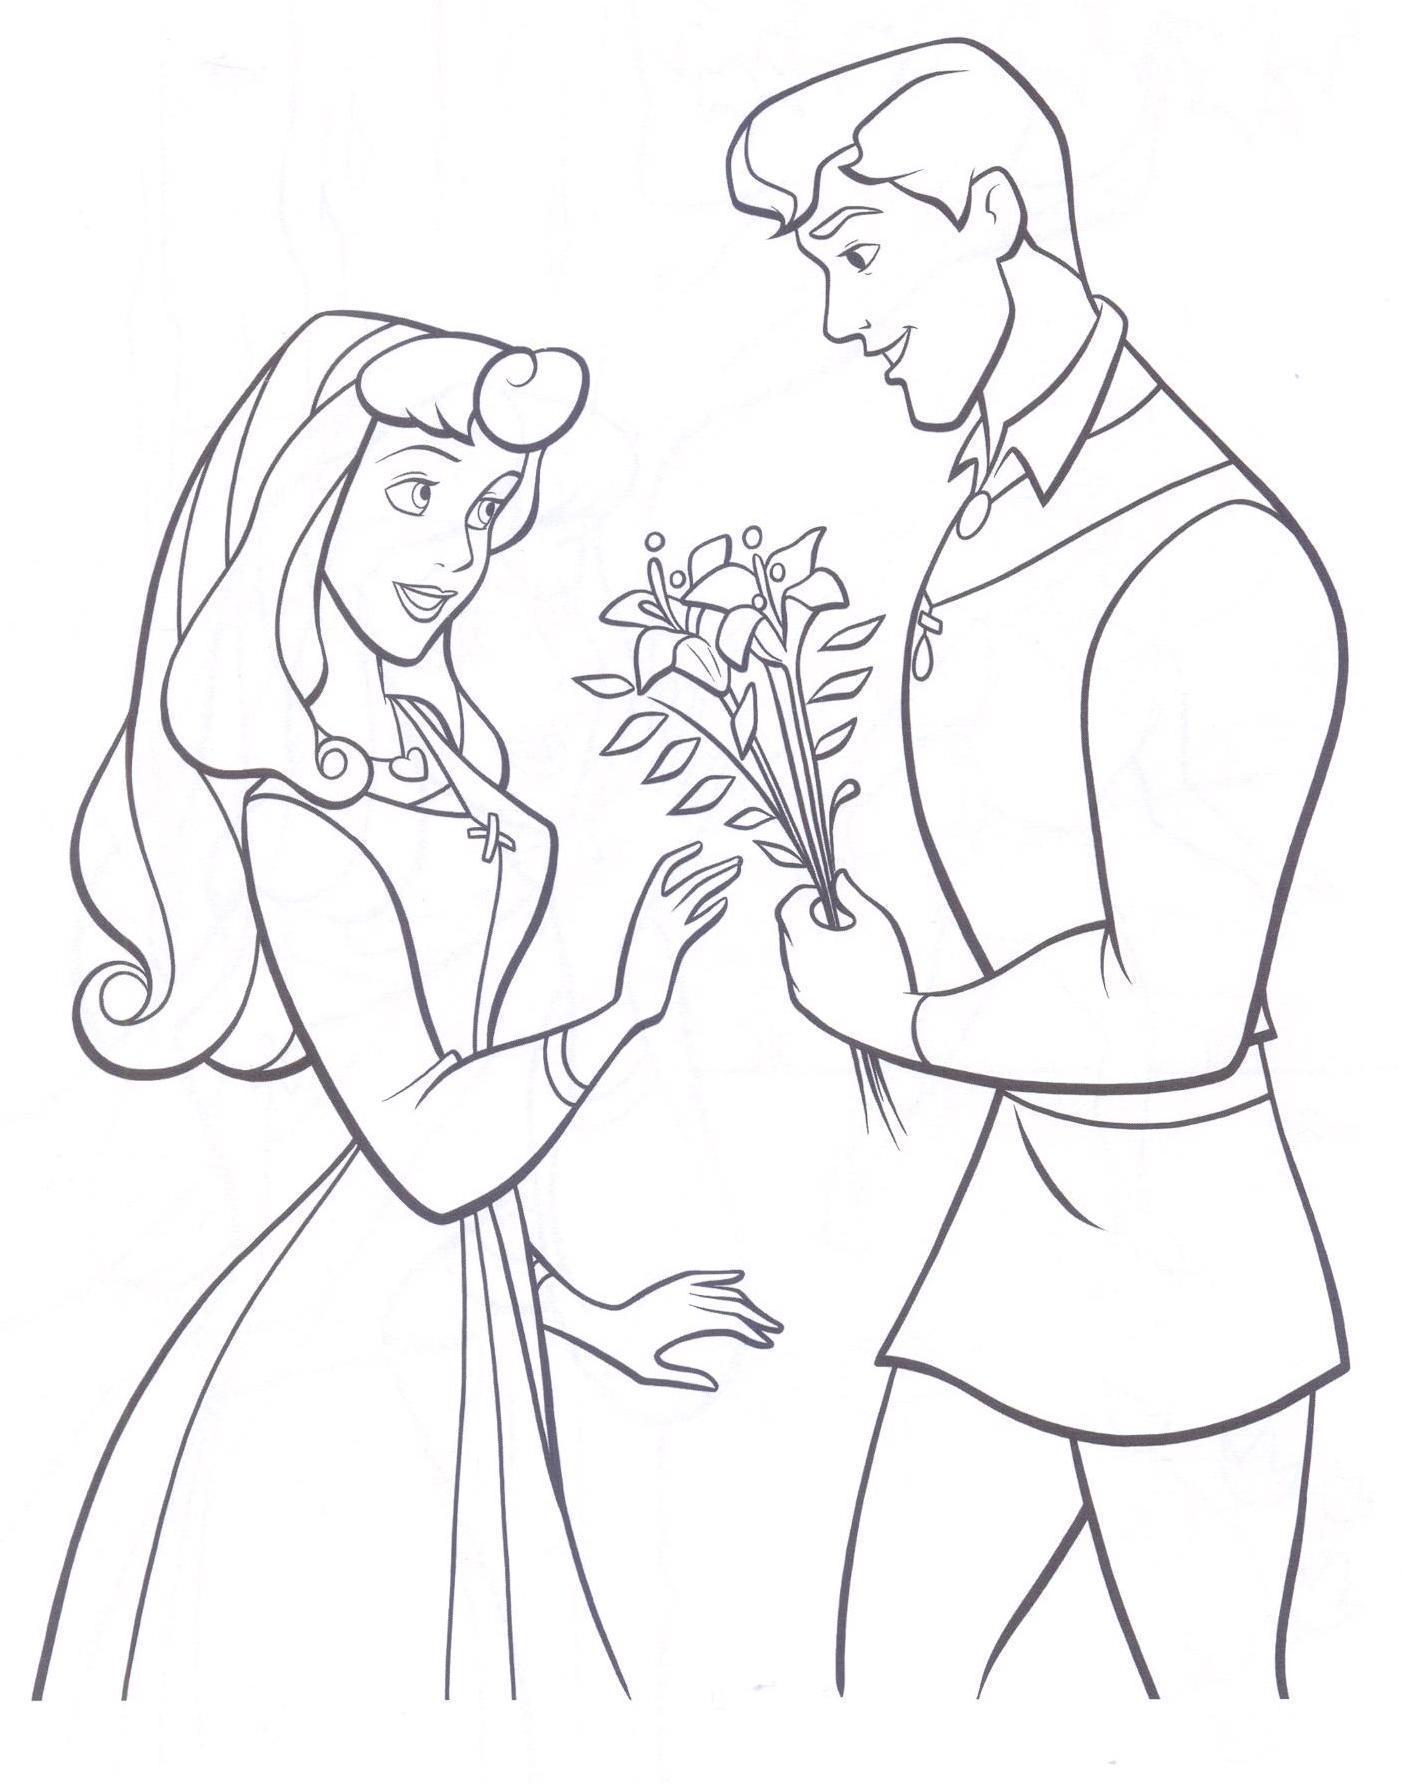 Disney Princess Drawing at GetDrawings.com | Free for personal use ...